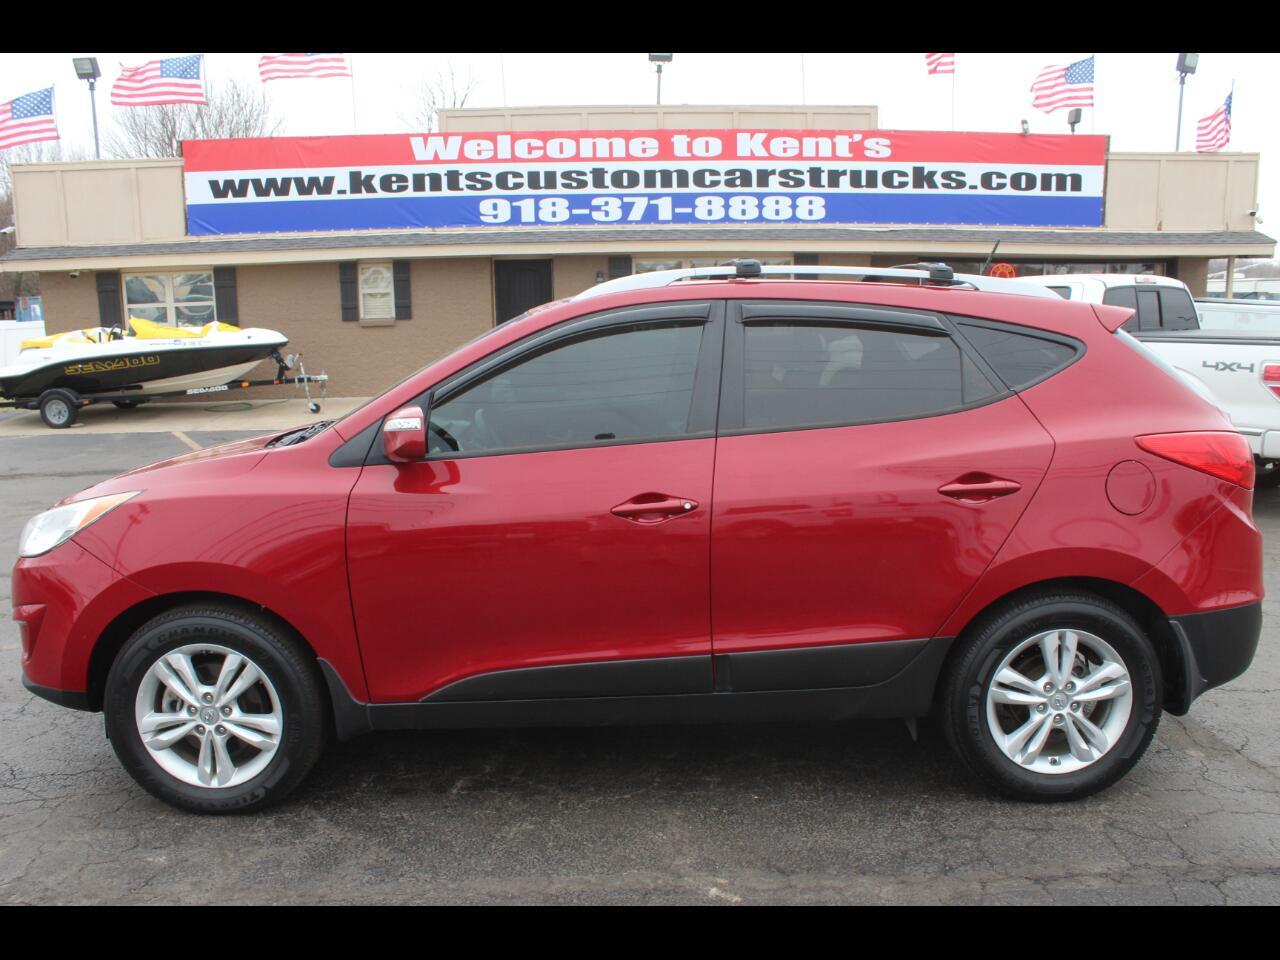 Hyundai Tucson FWD 4dr Auto GLS 2012